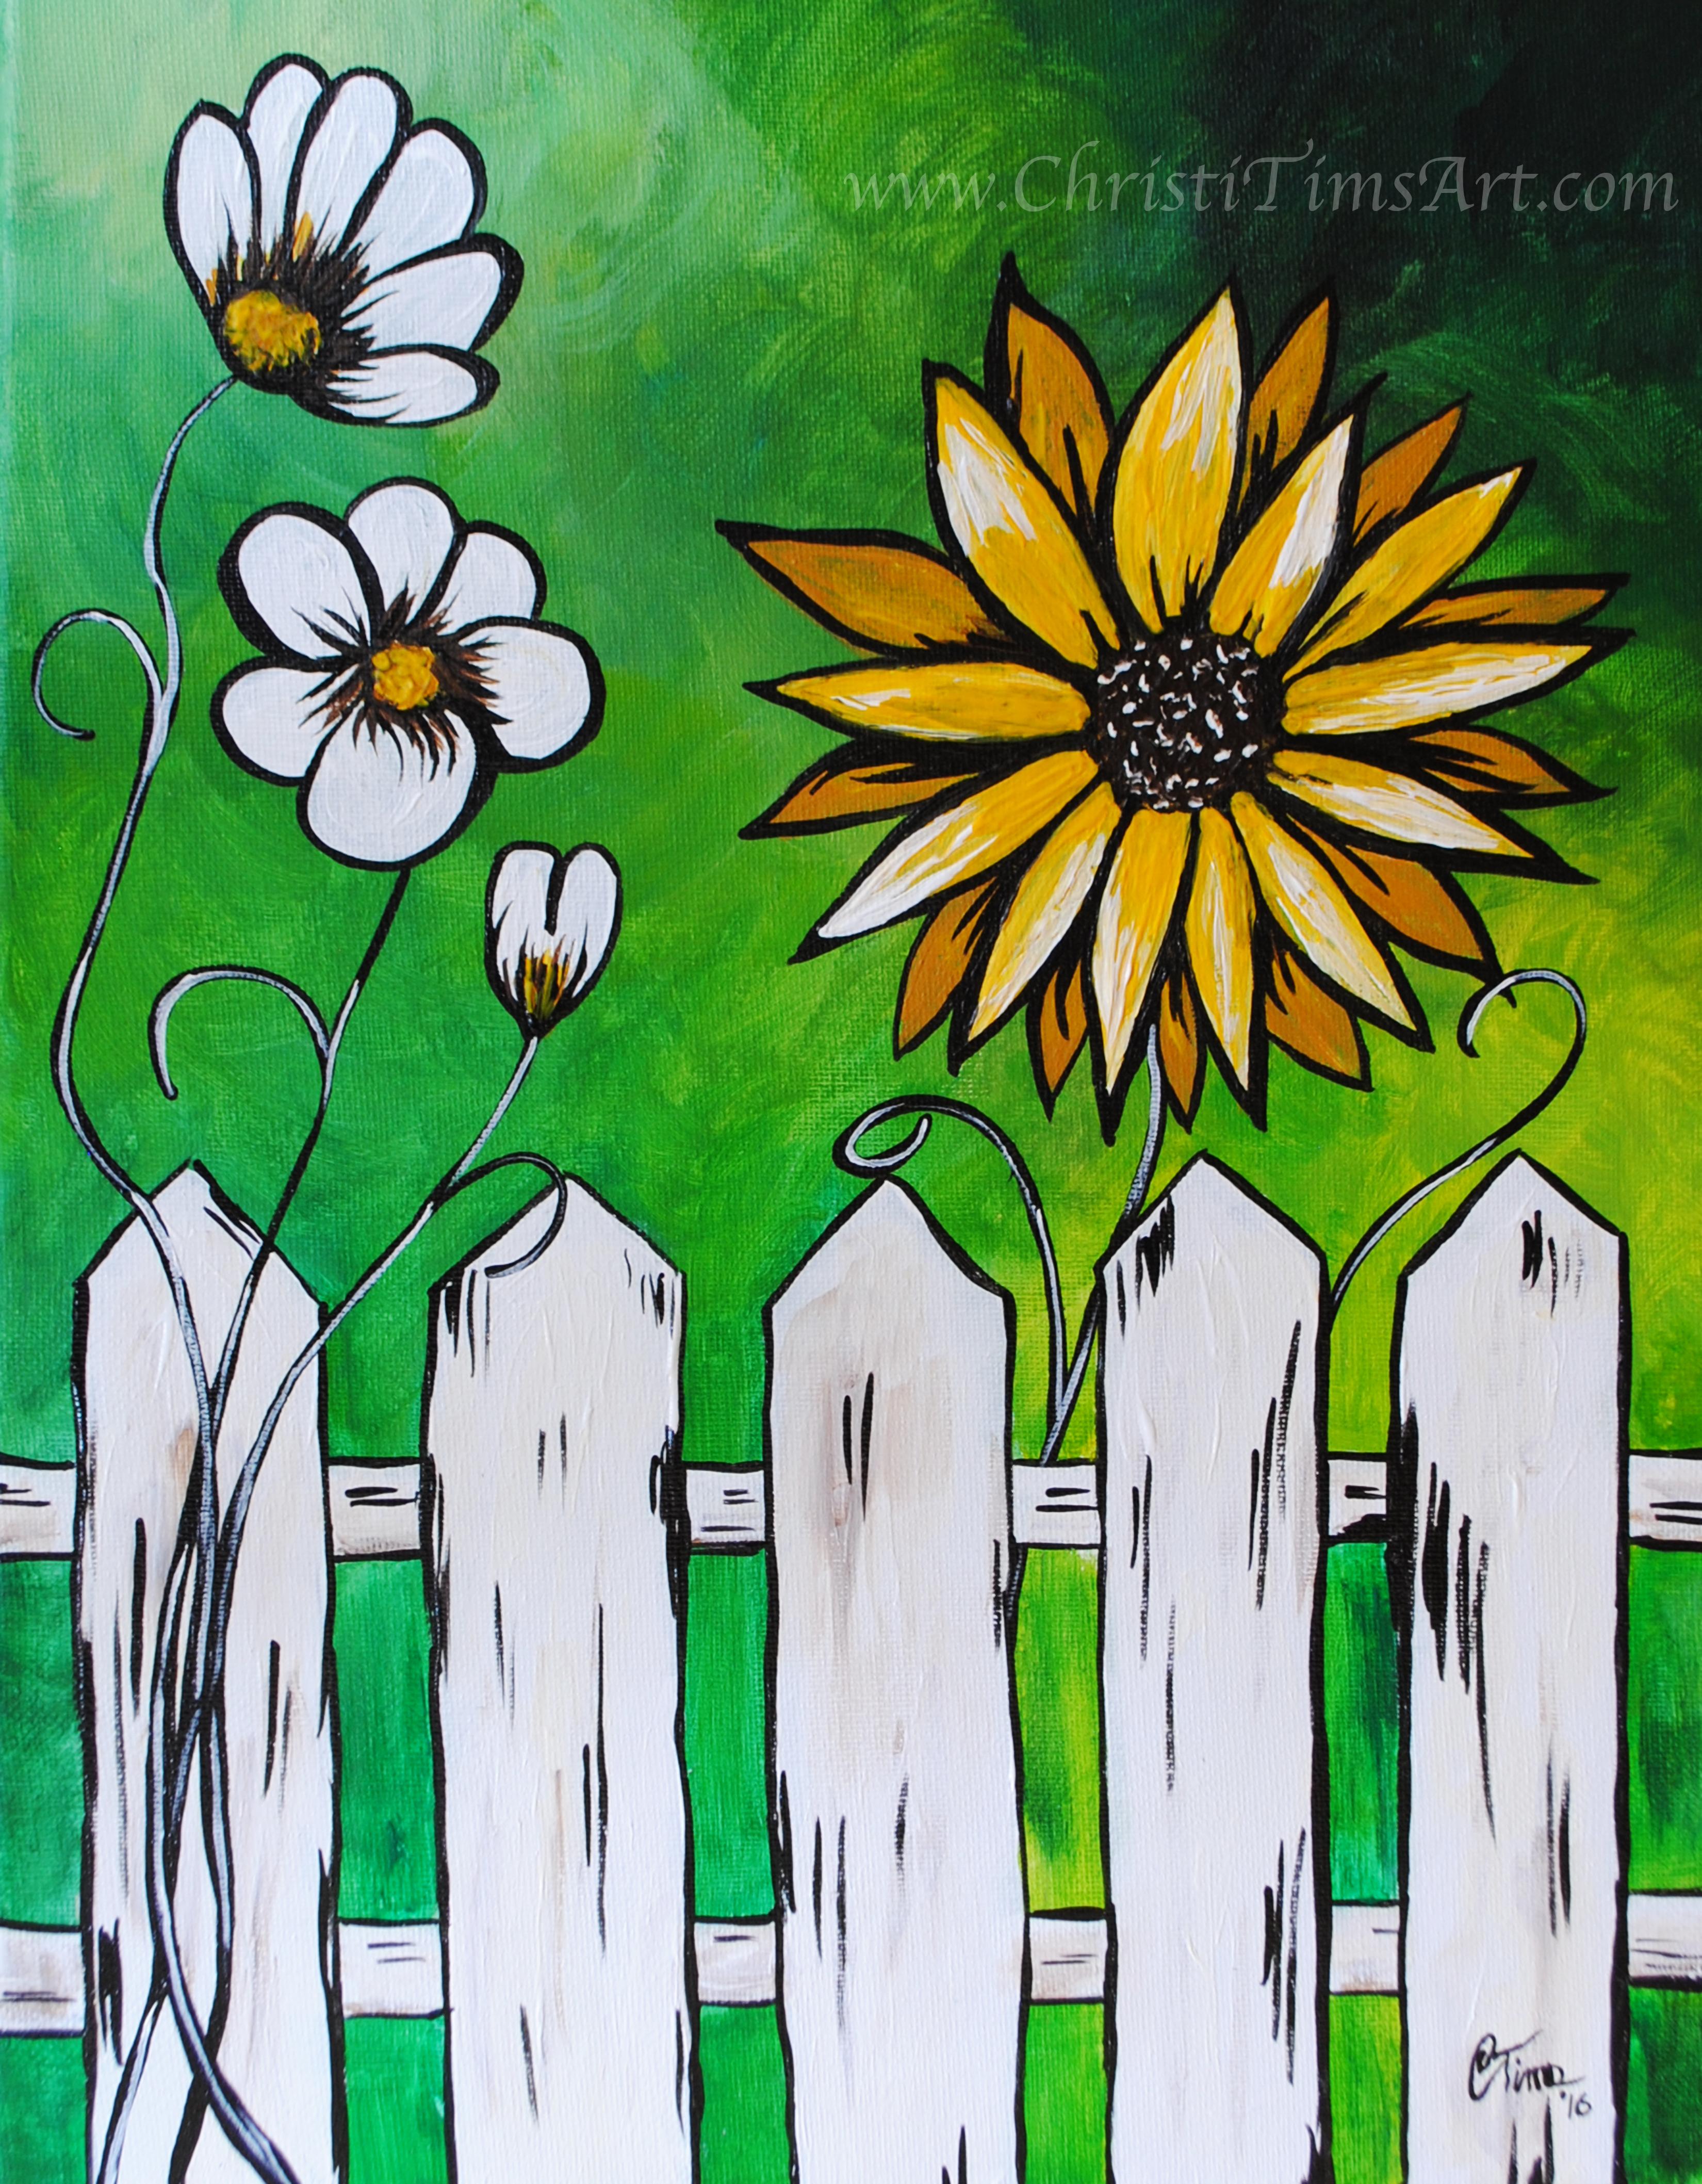 Springtime Fence & Flowers Christi T